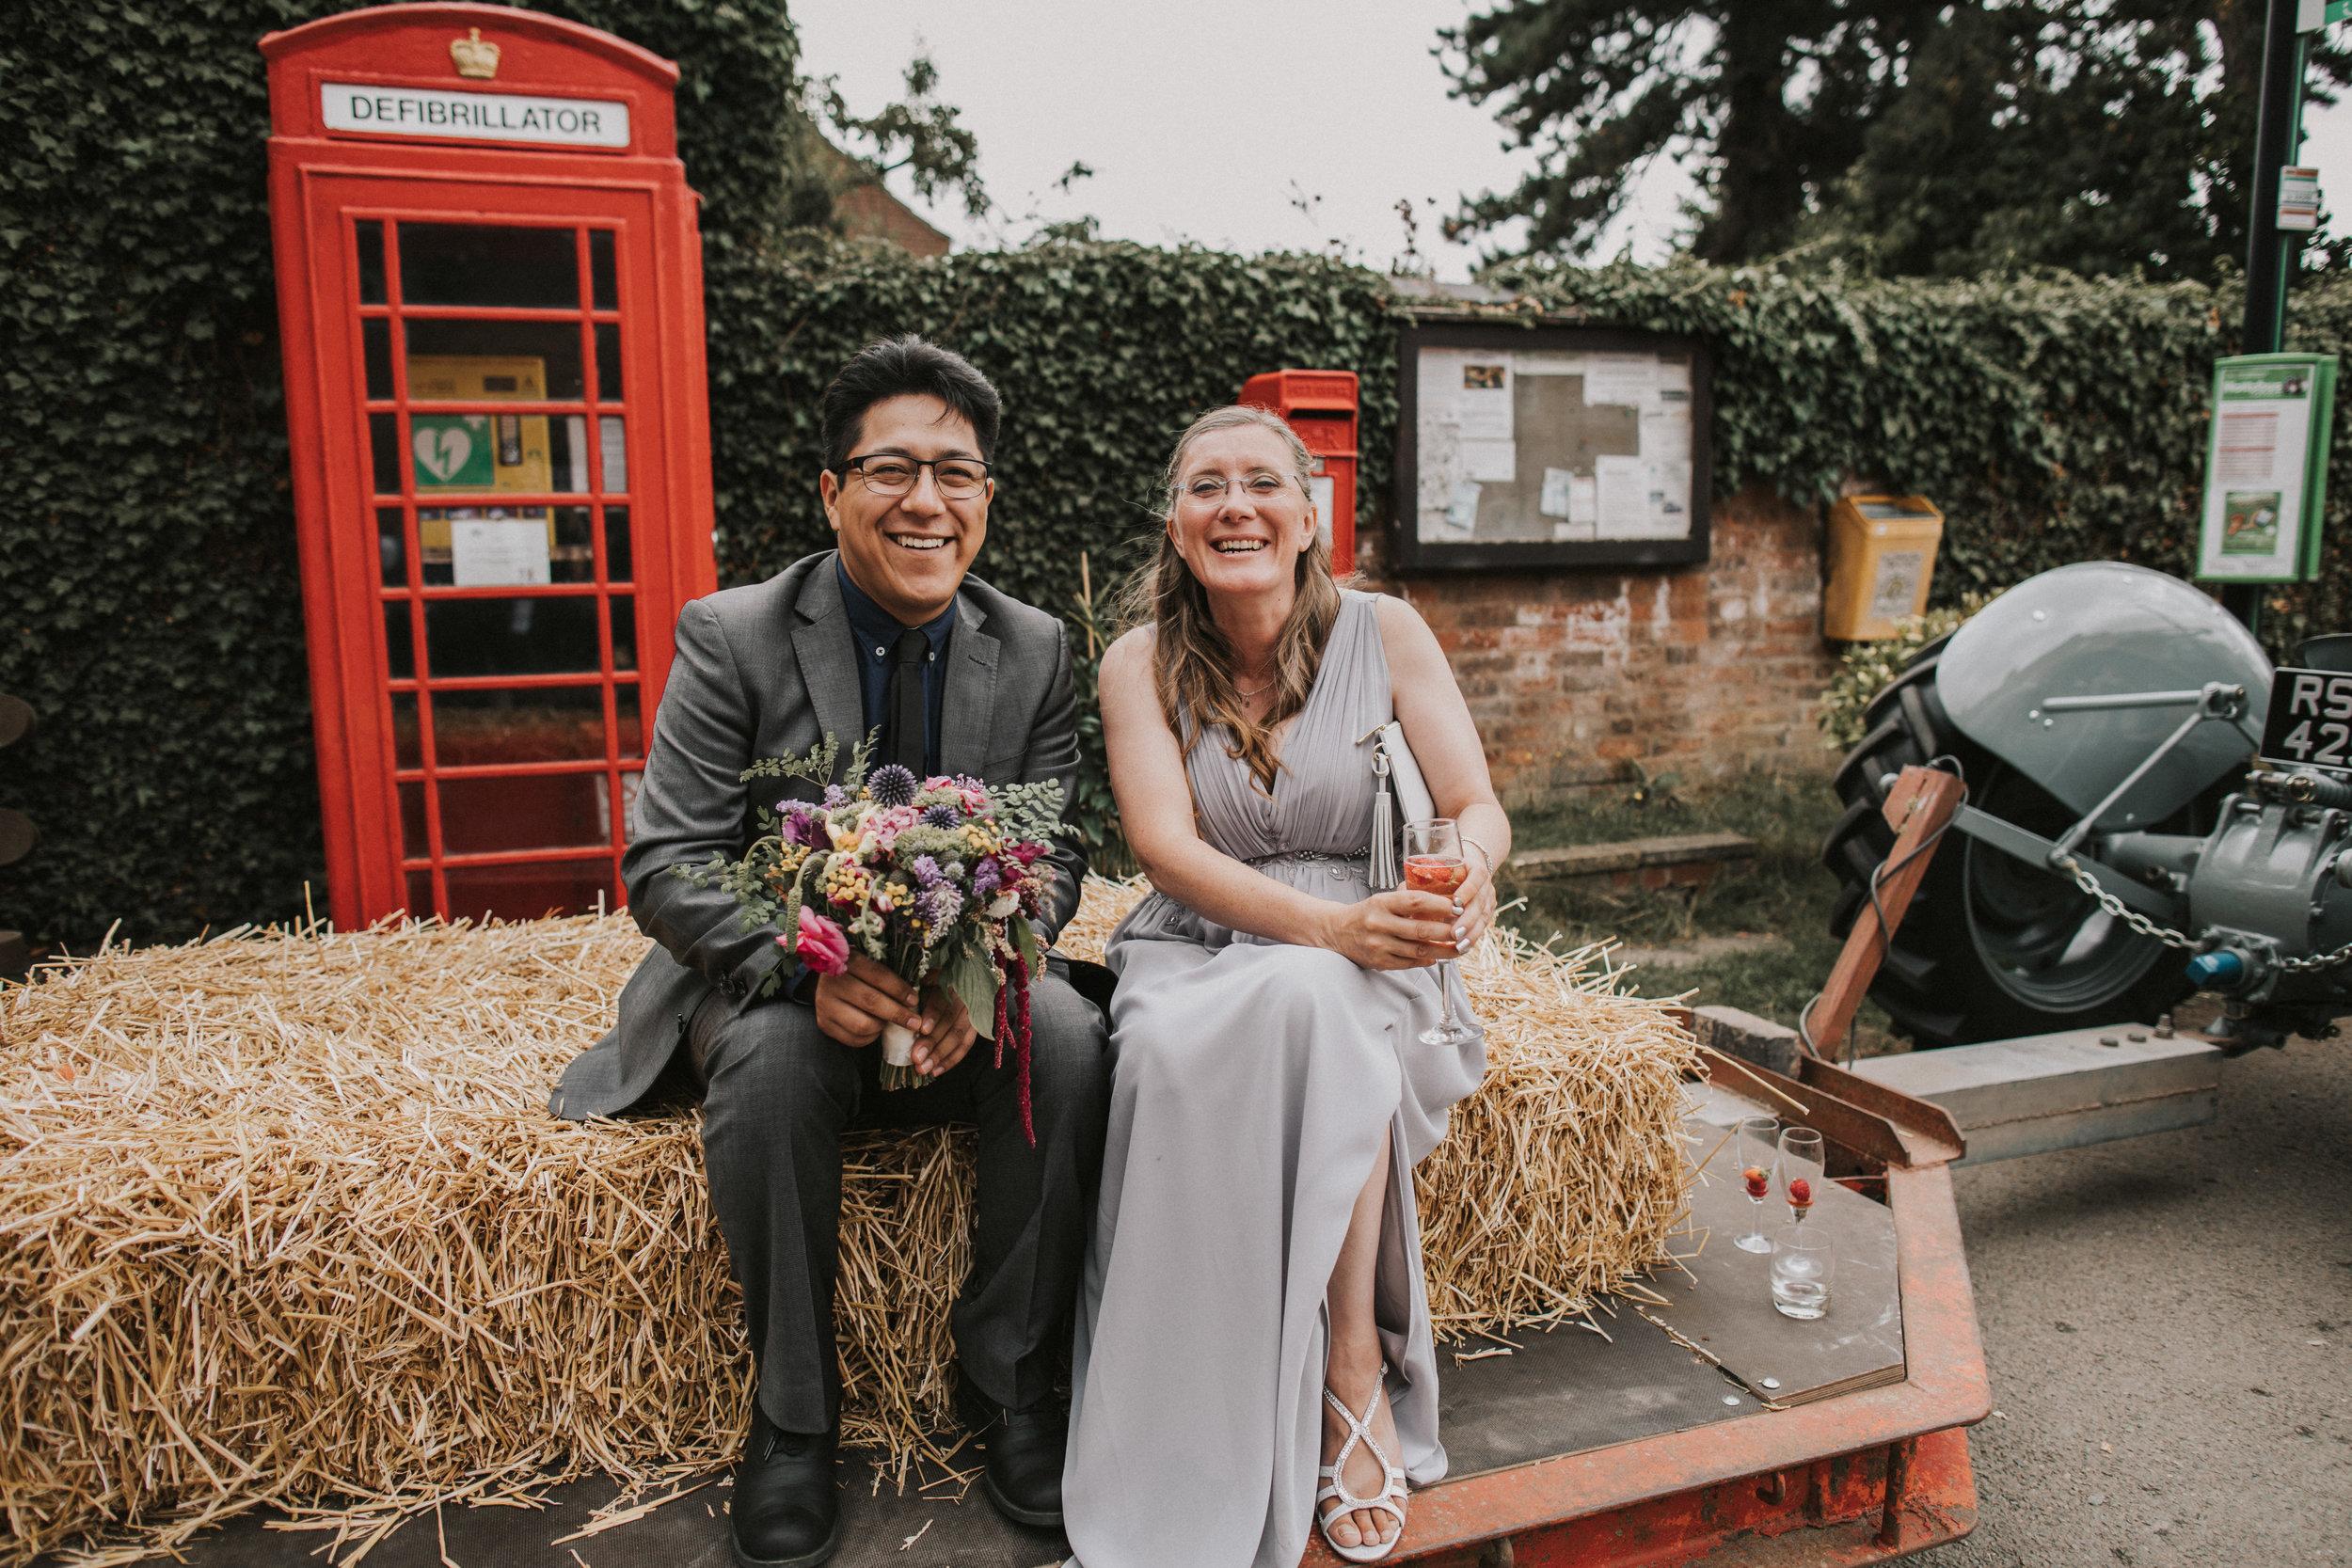 brook rose photography  Farm wedding_30.jpg